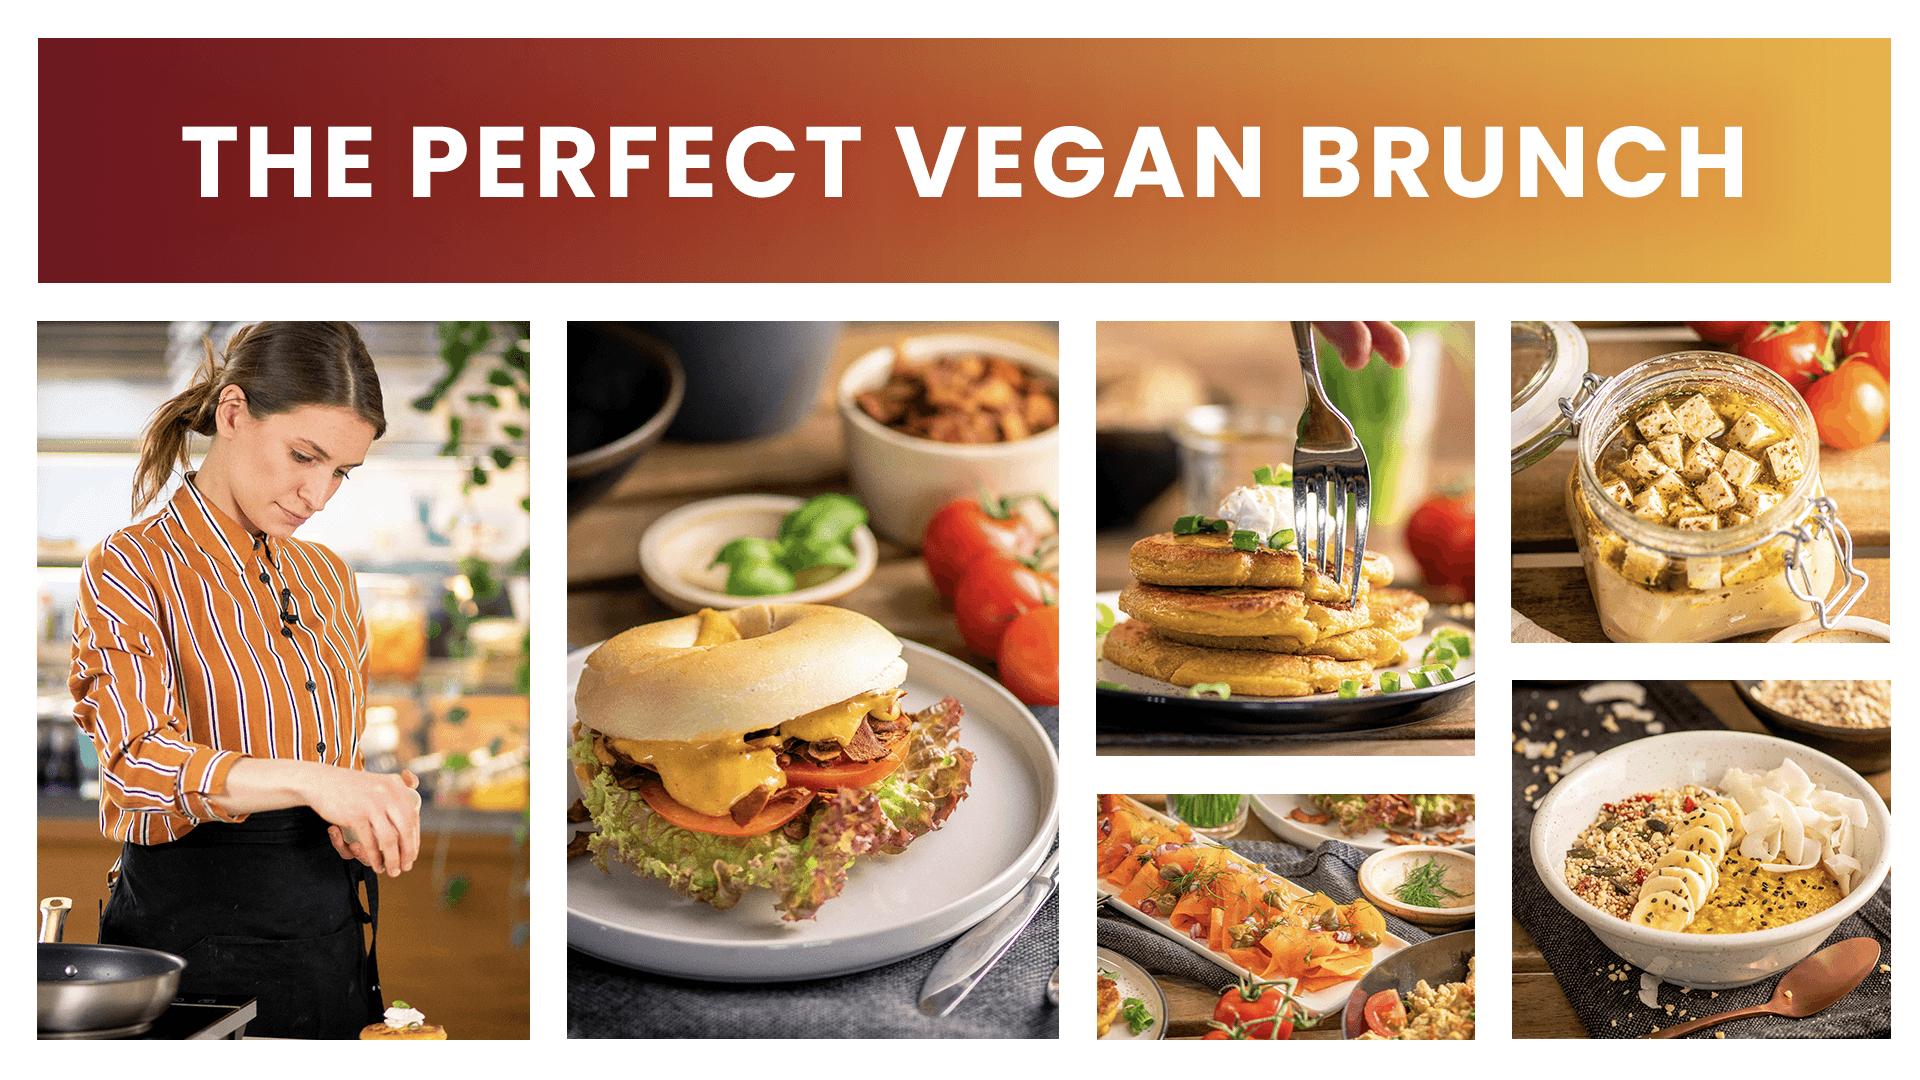 The Perfect Vegan Brunch Online Course